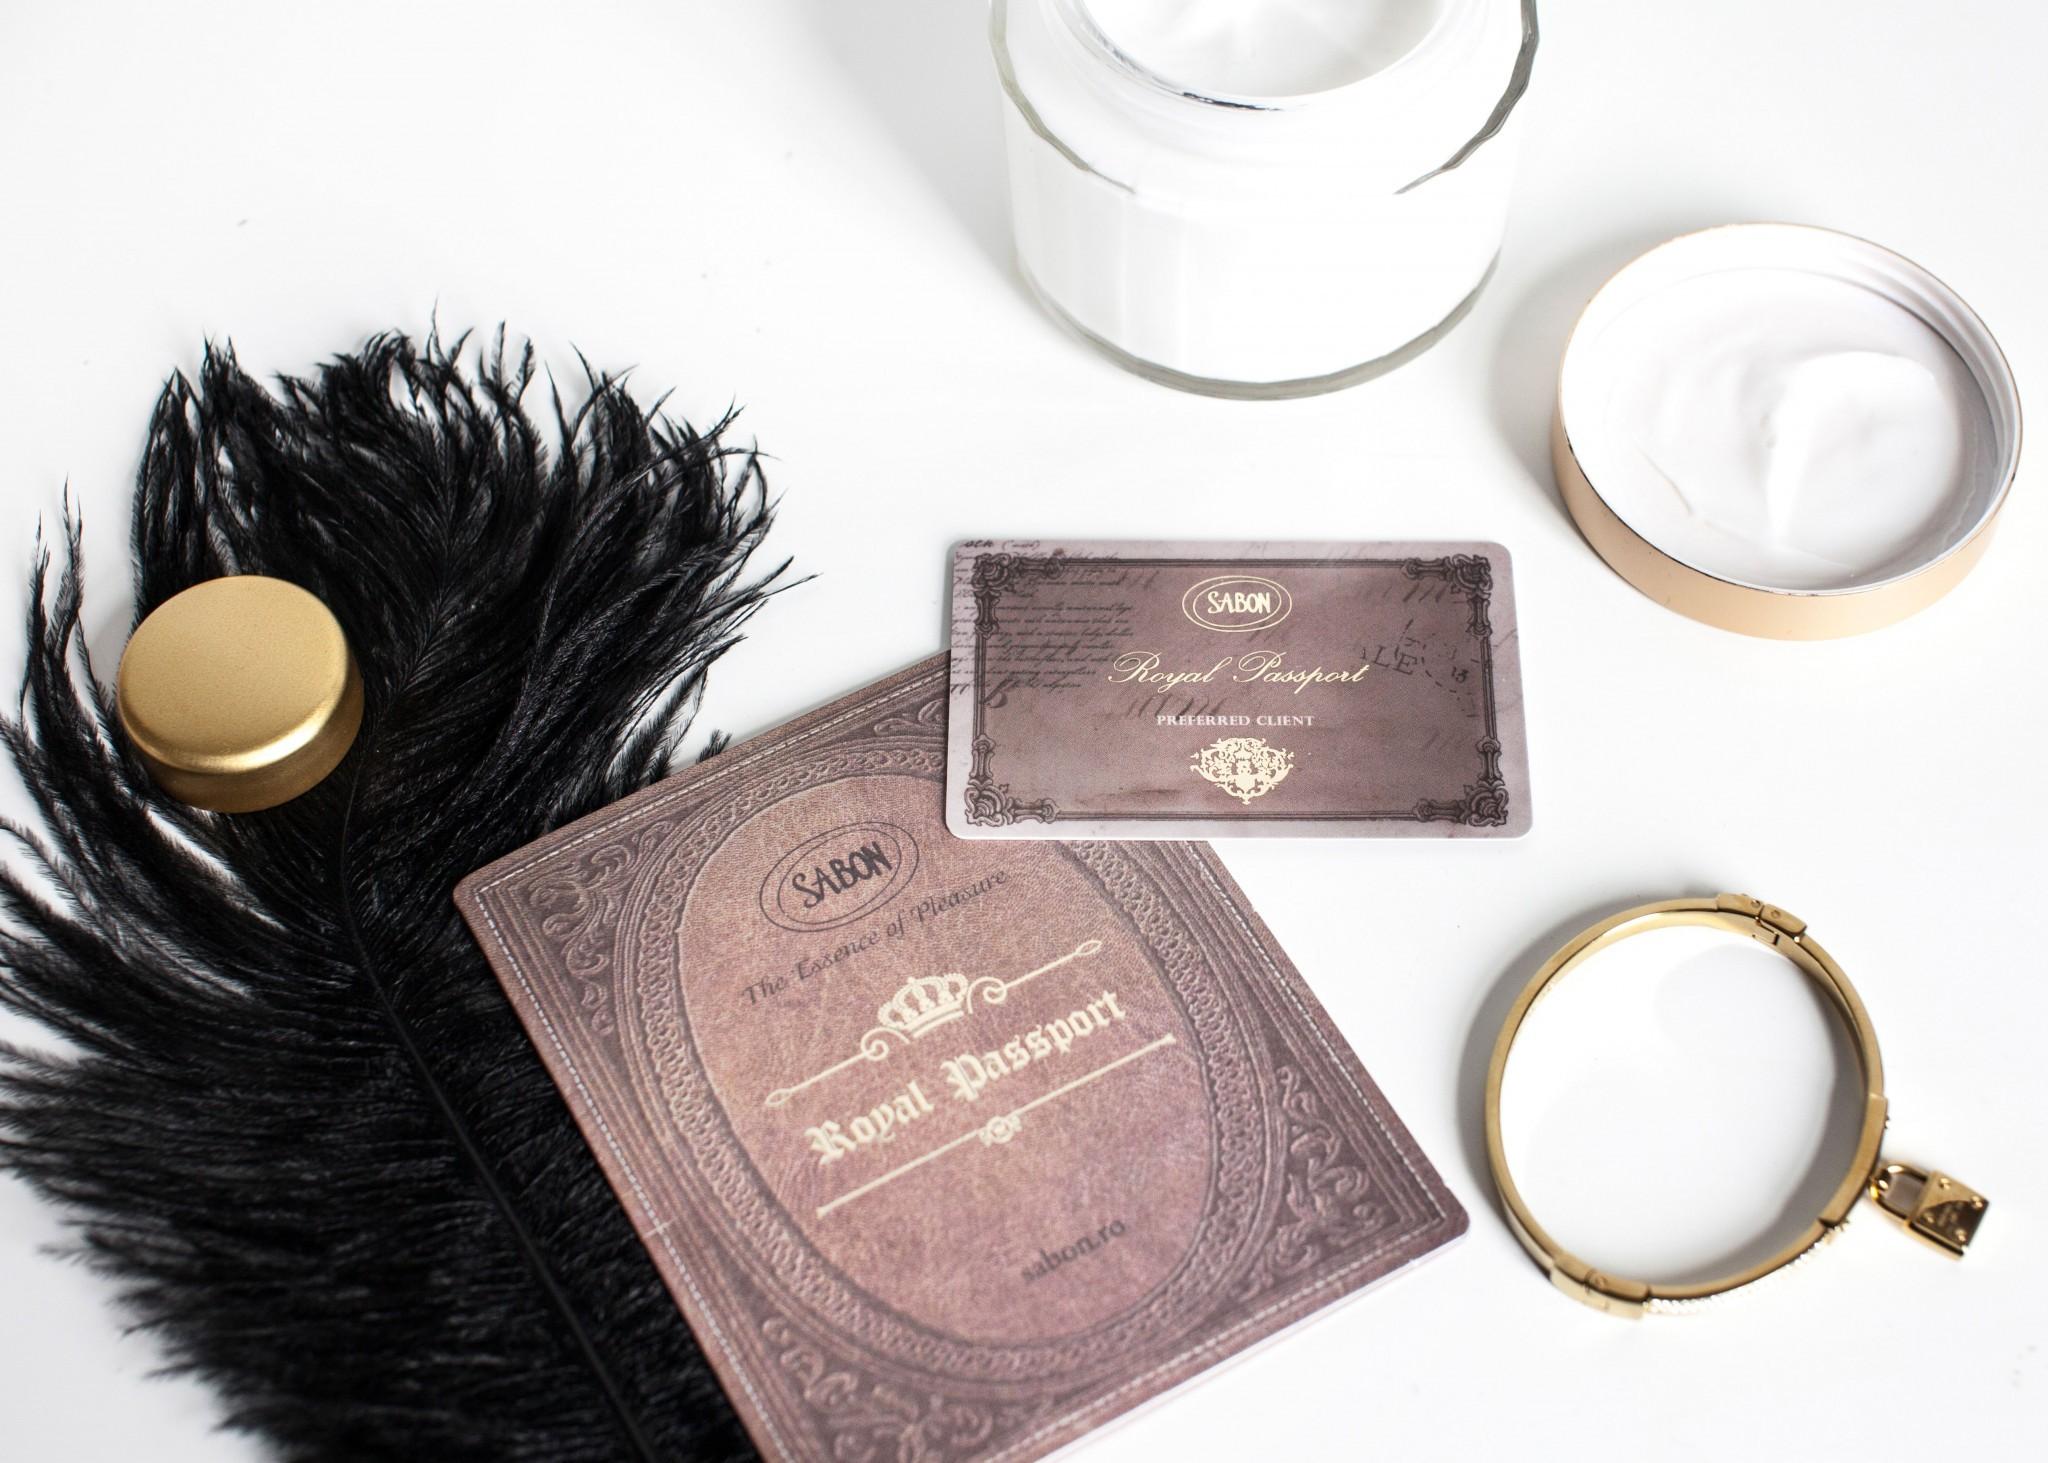 8sabon_royal_passport_fabulous_muses_fabuloasele_topcosmetice